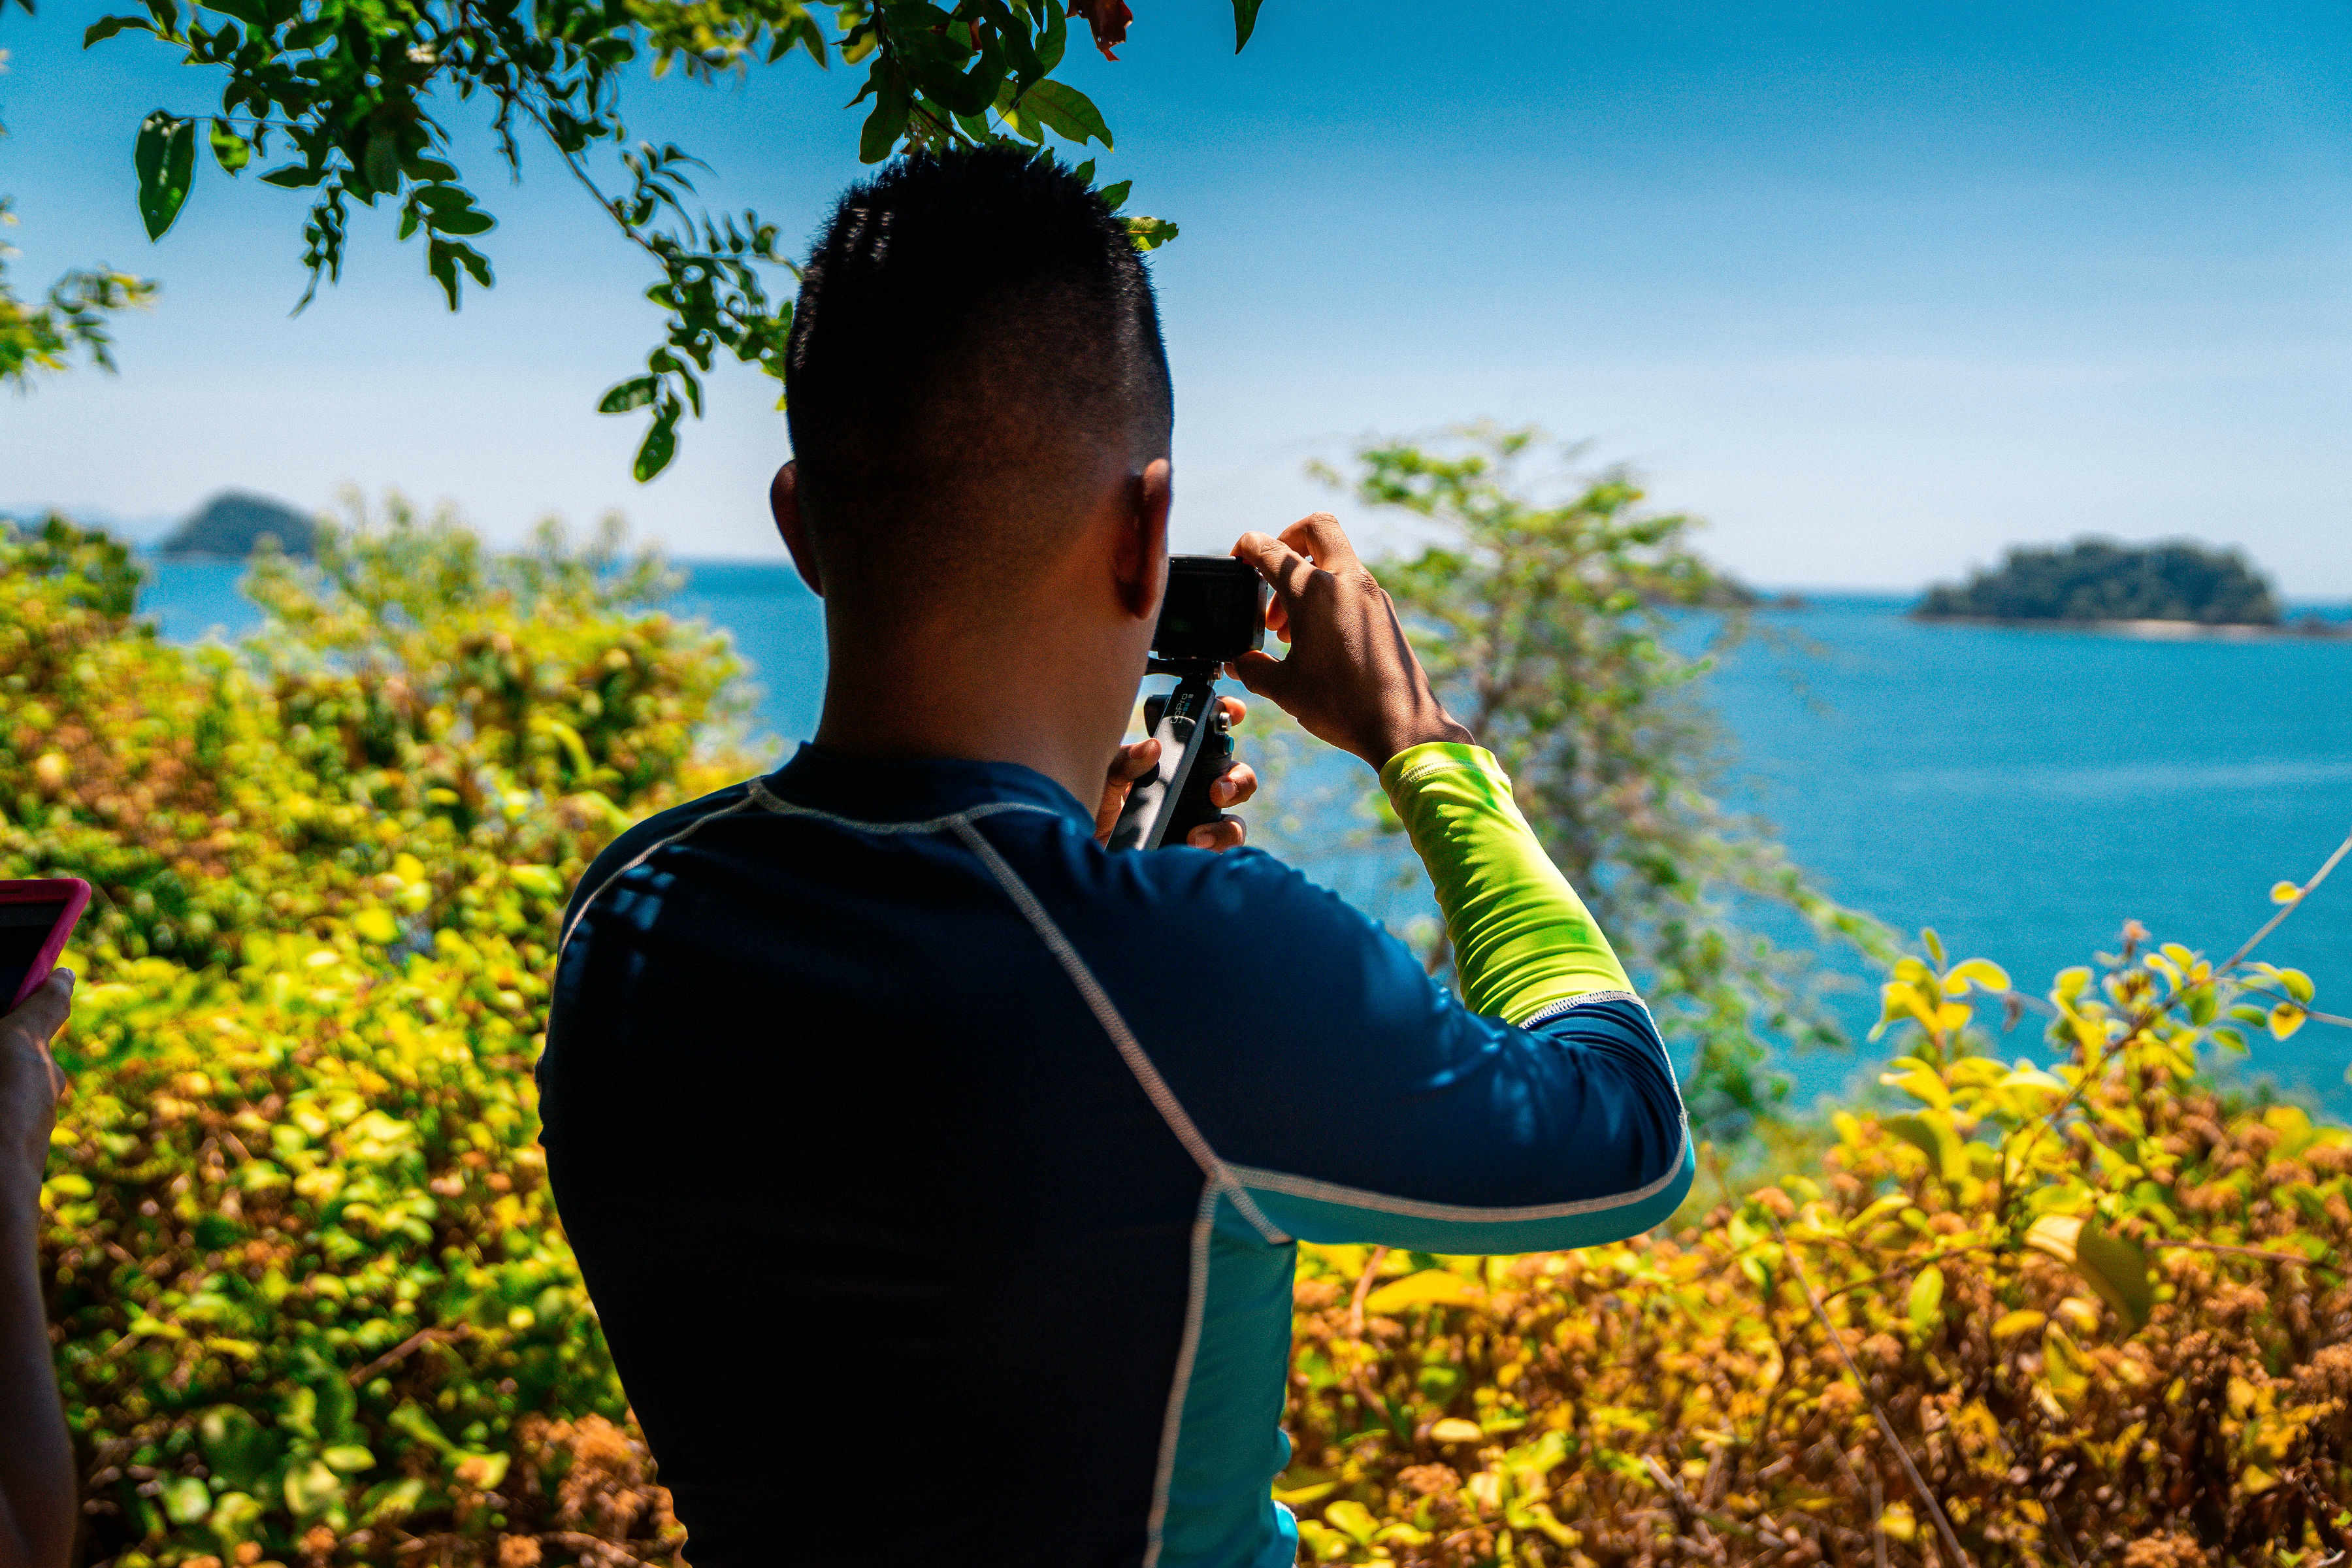 Fotografiando al fotografo